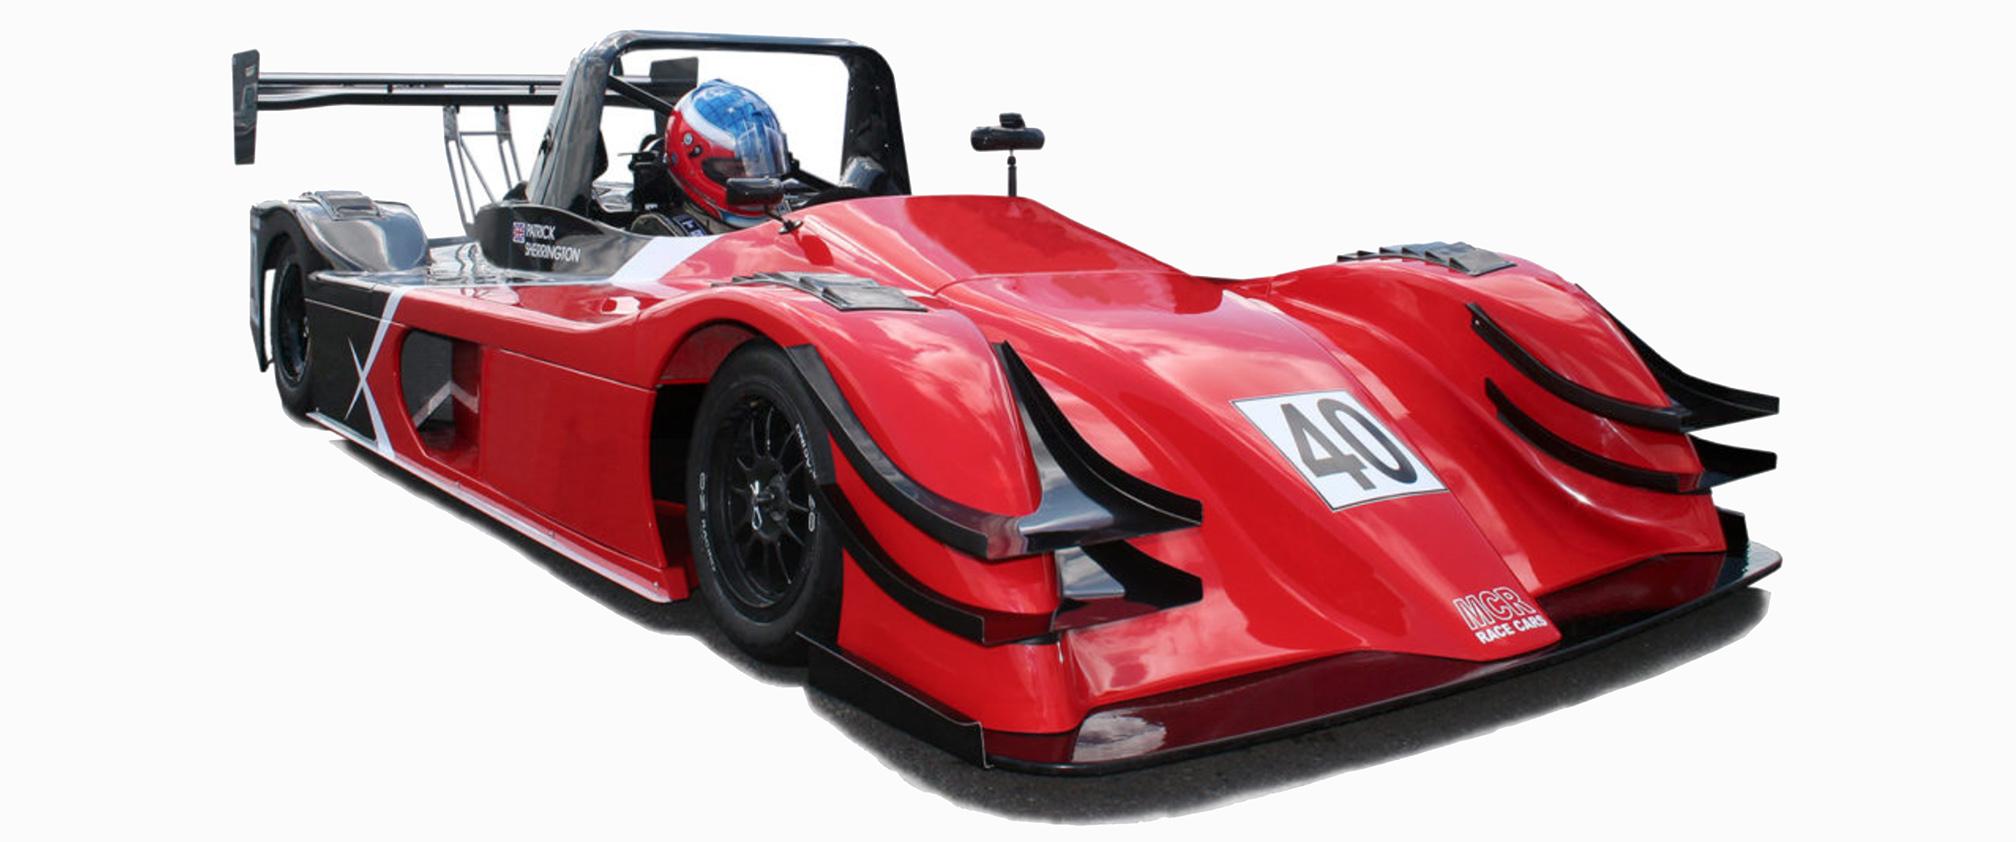 MCR Racing Cars sports prototype